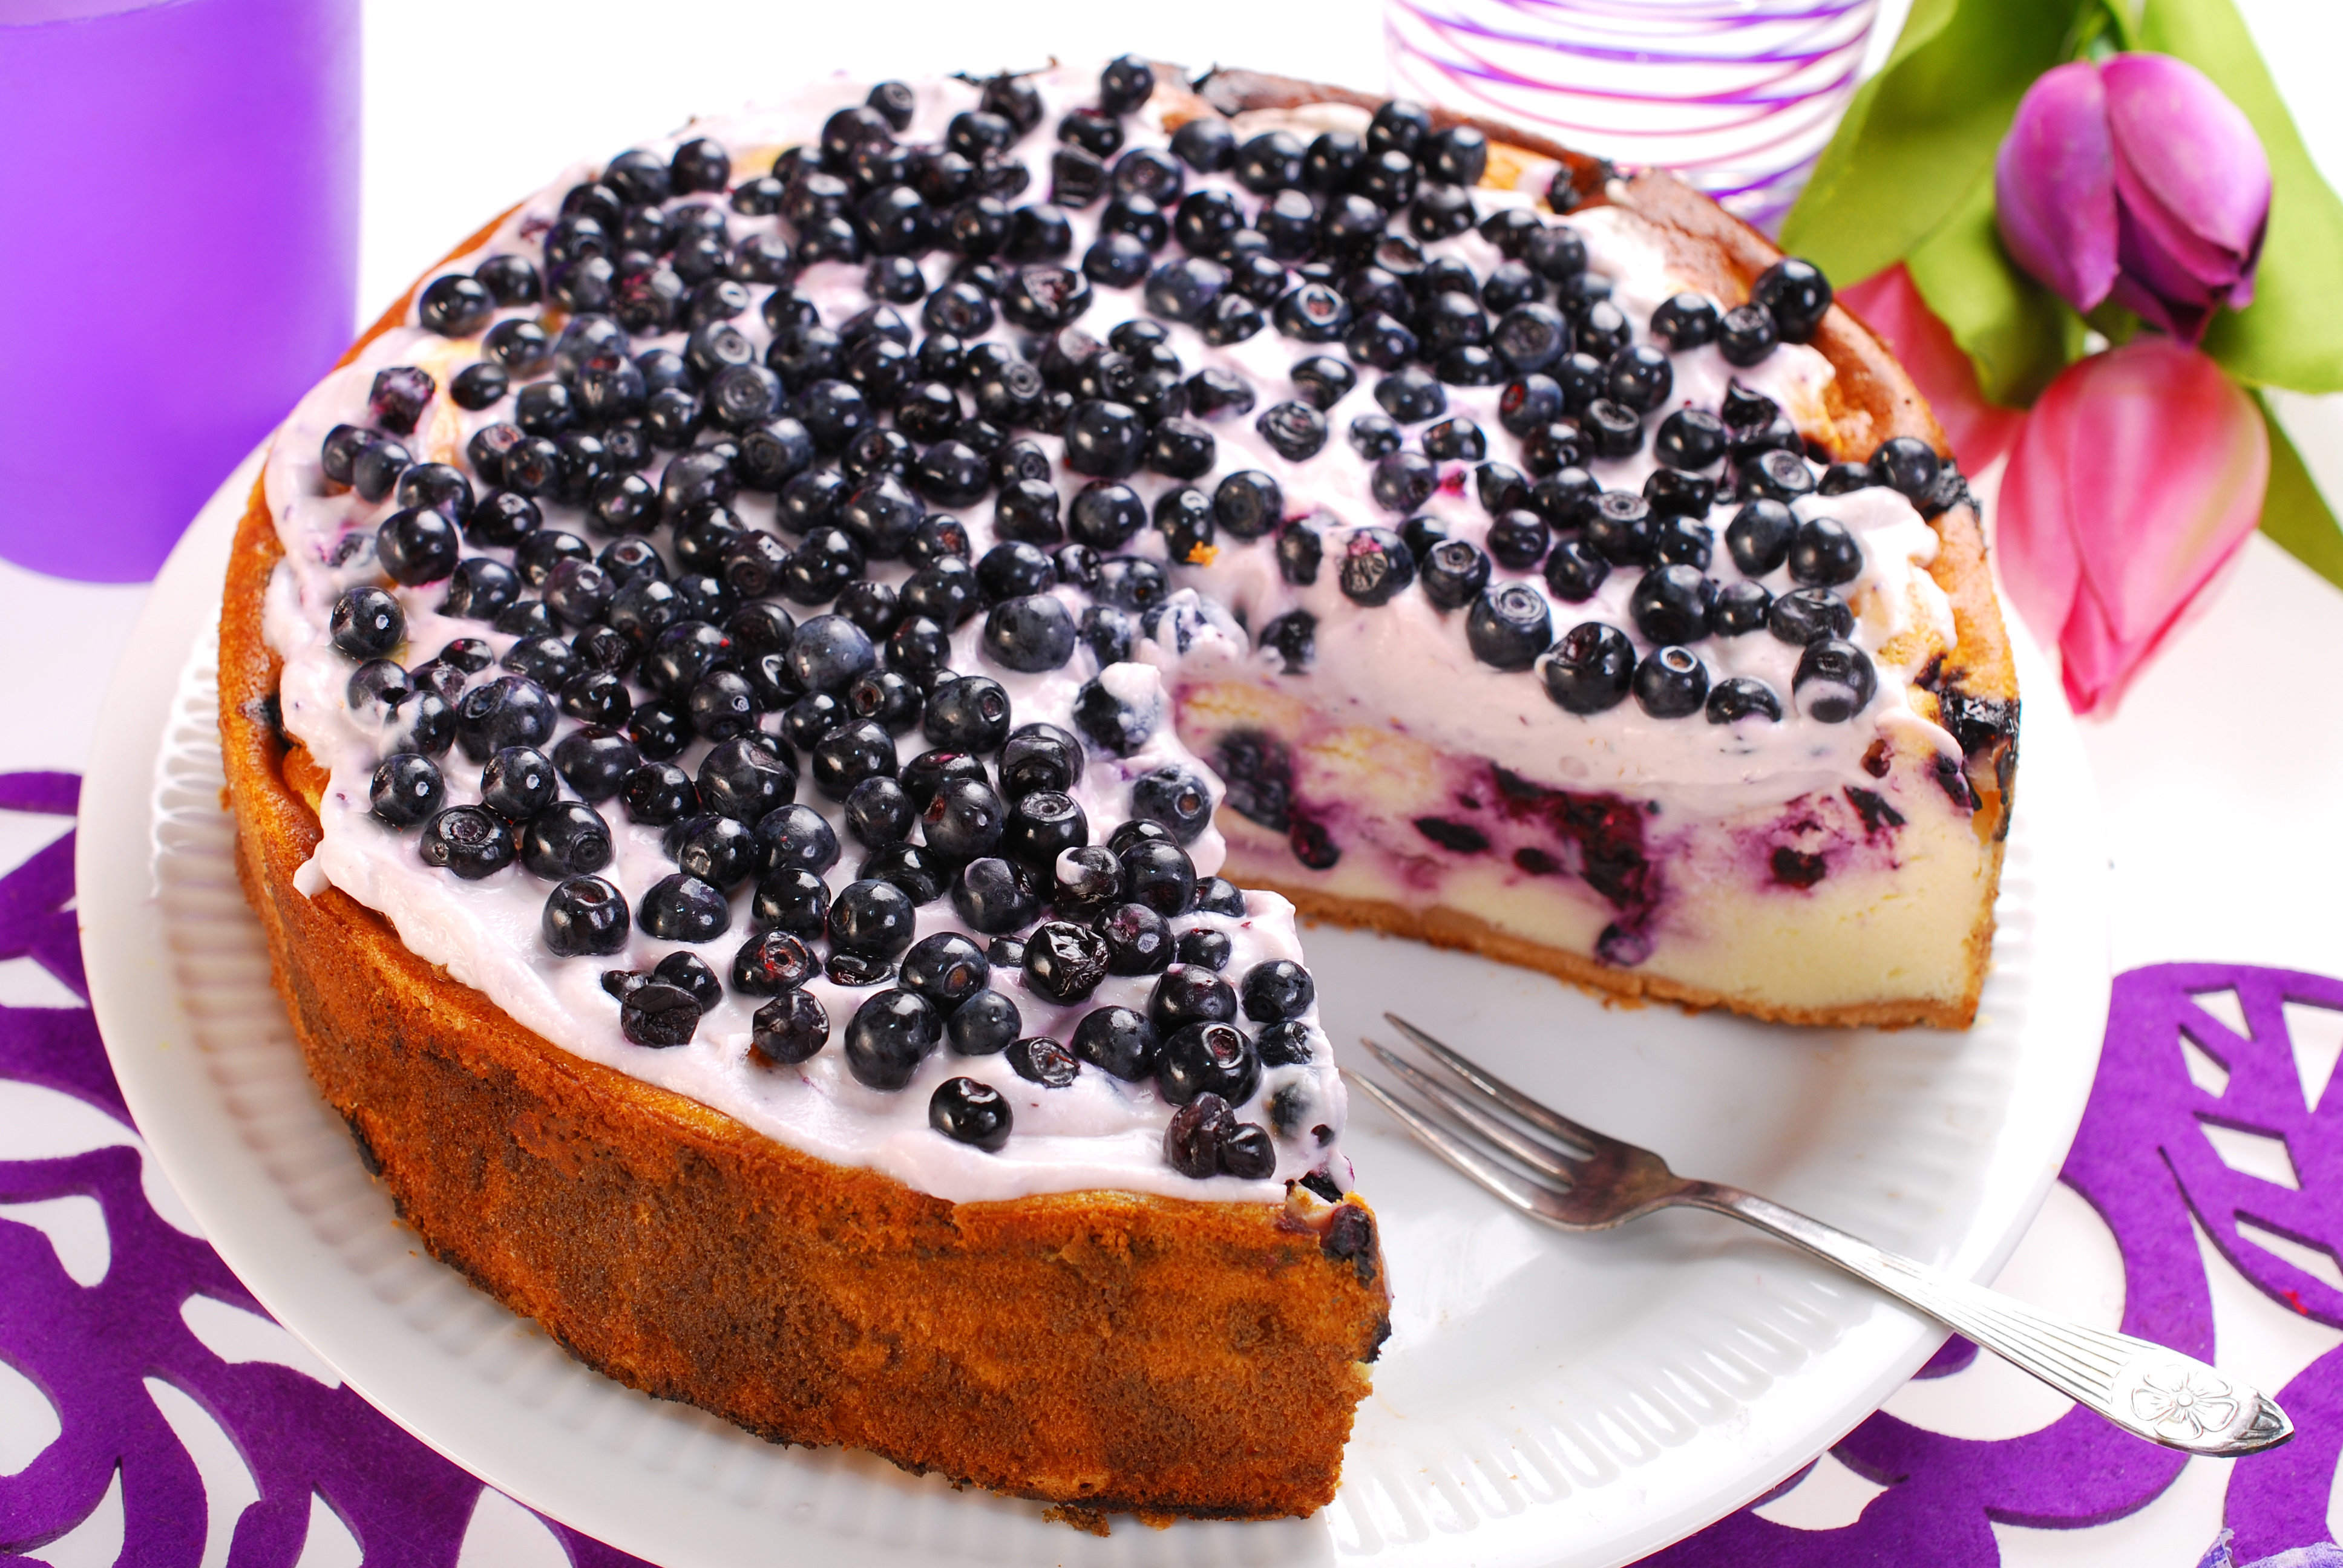 торт пирог  № 1406664 бесплатно